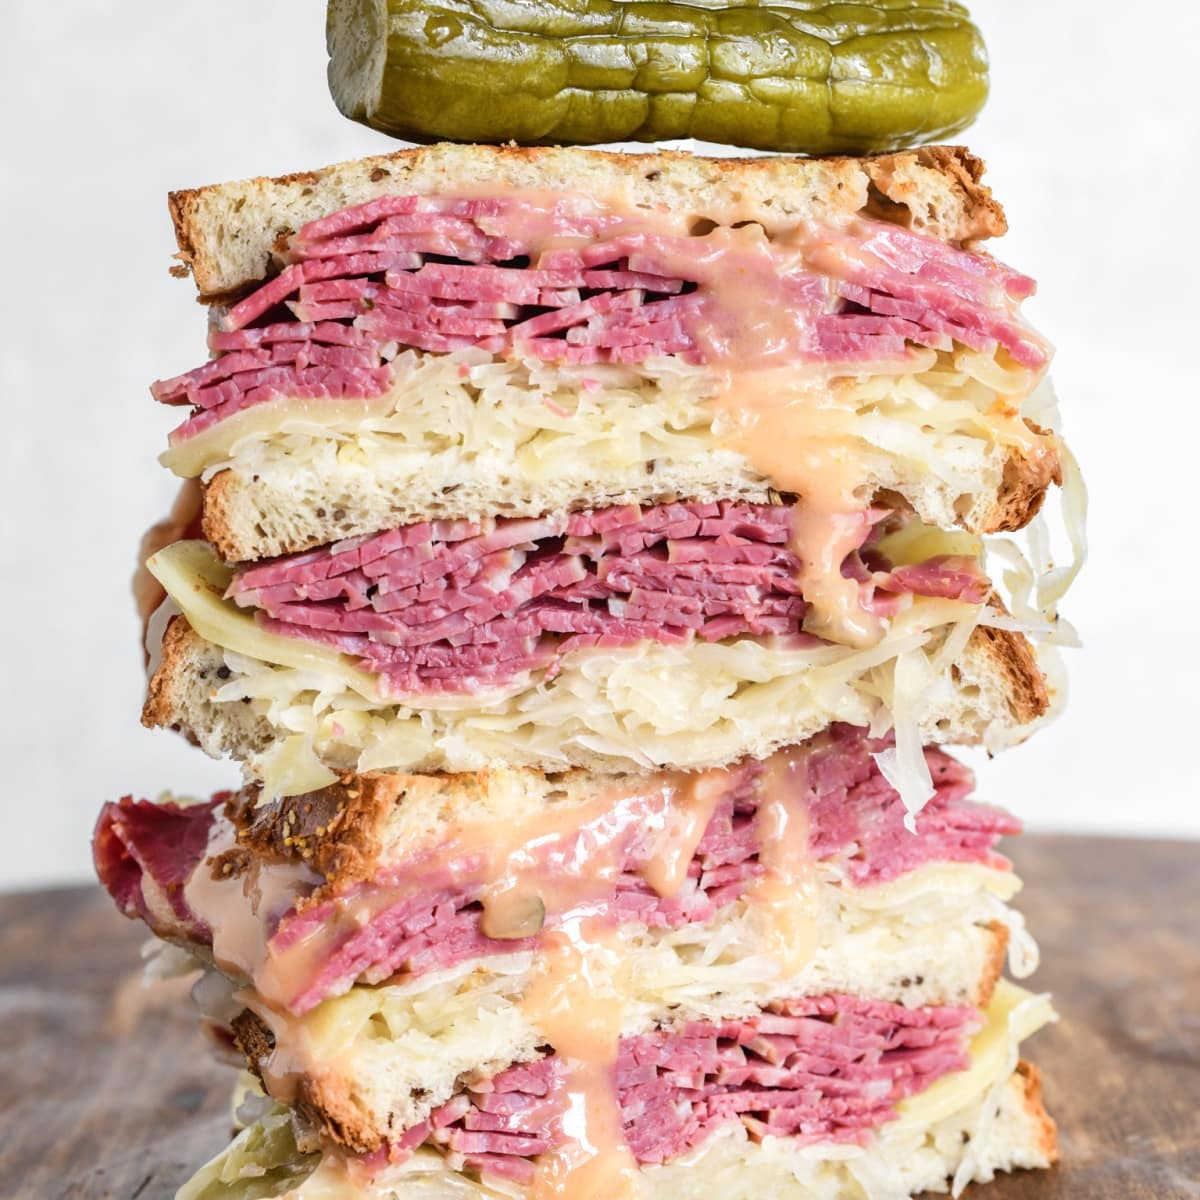 Leibmans classic Reuben sandwich